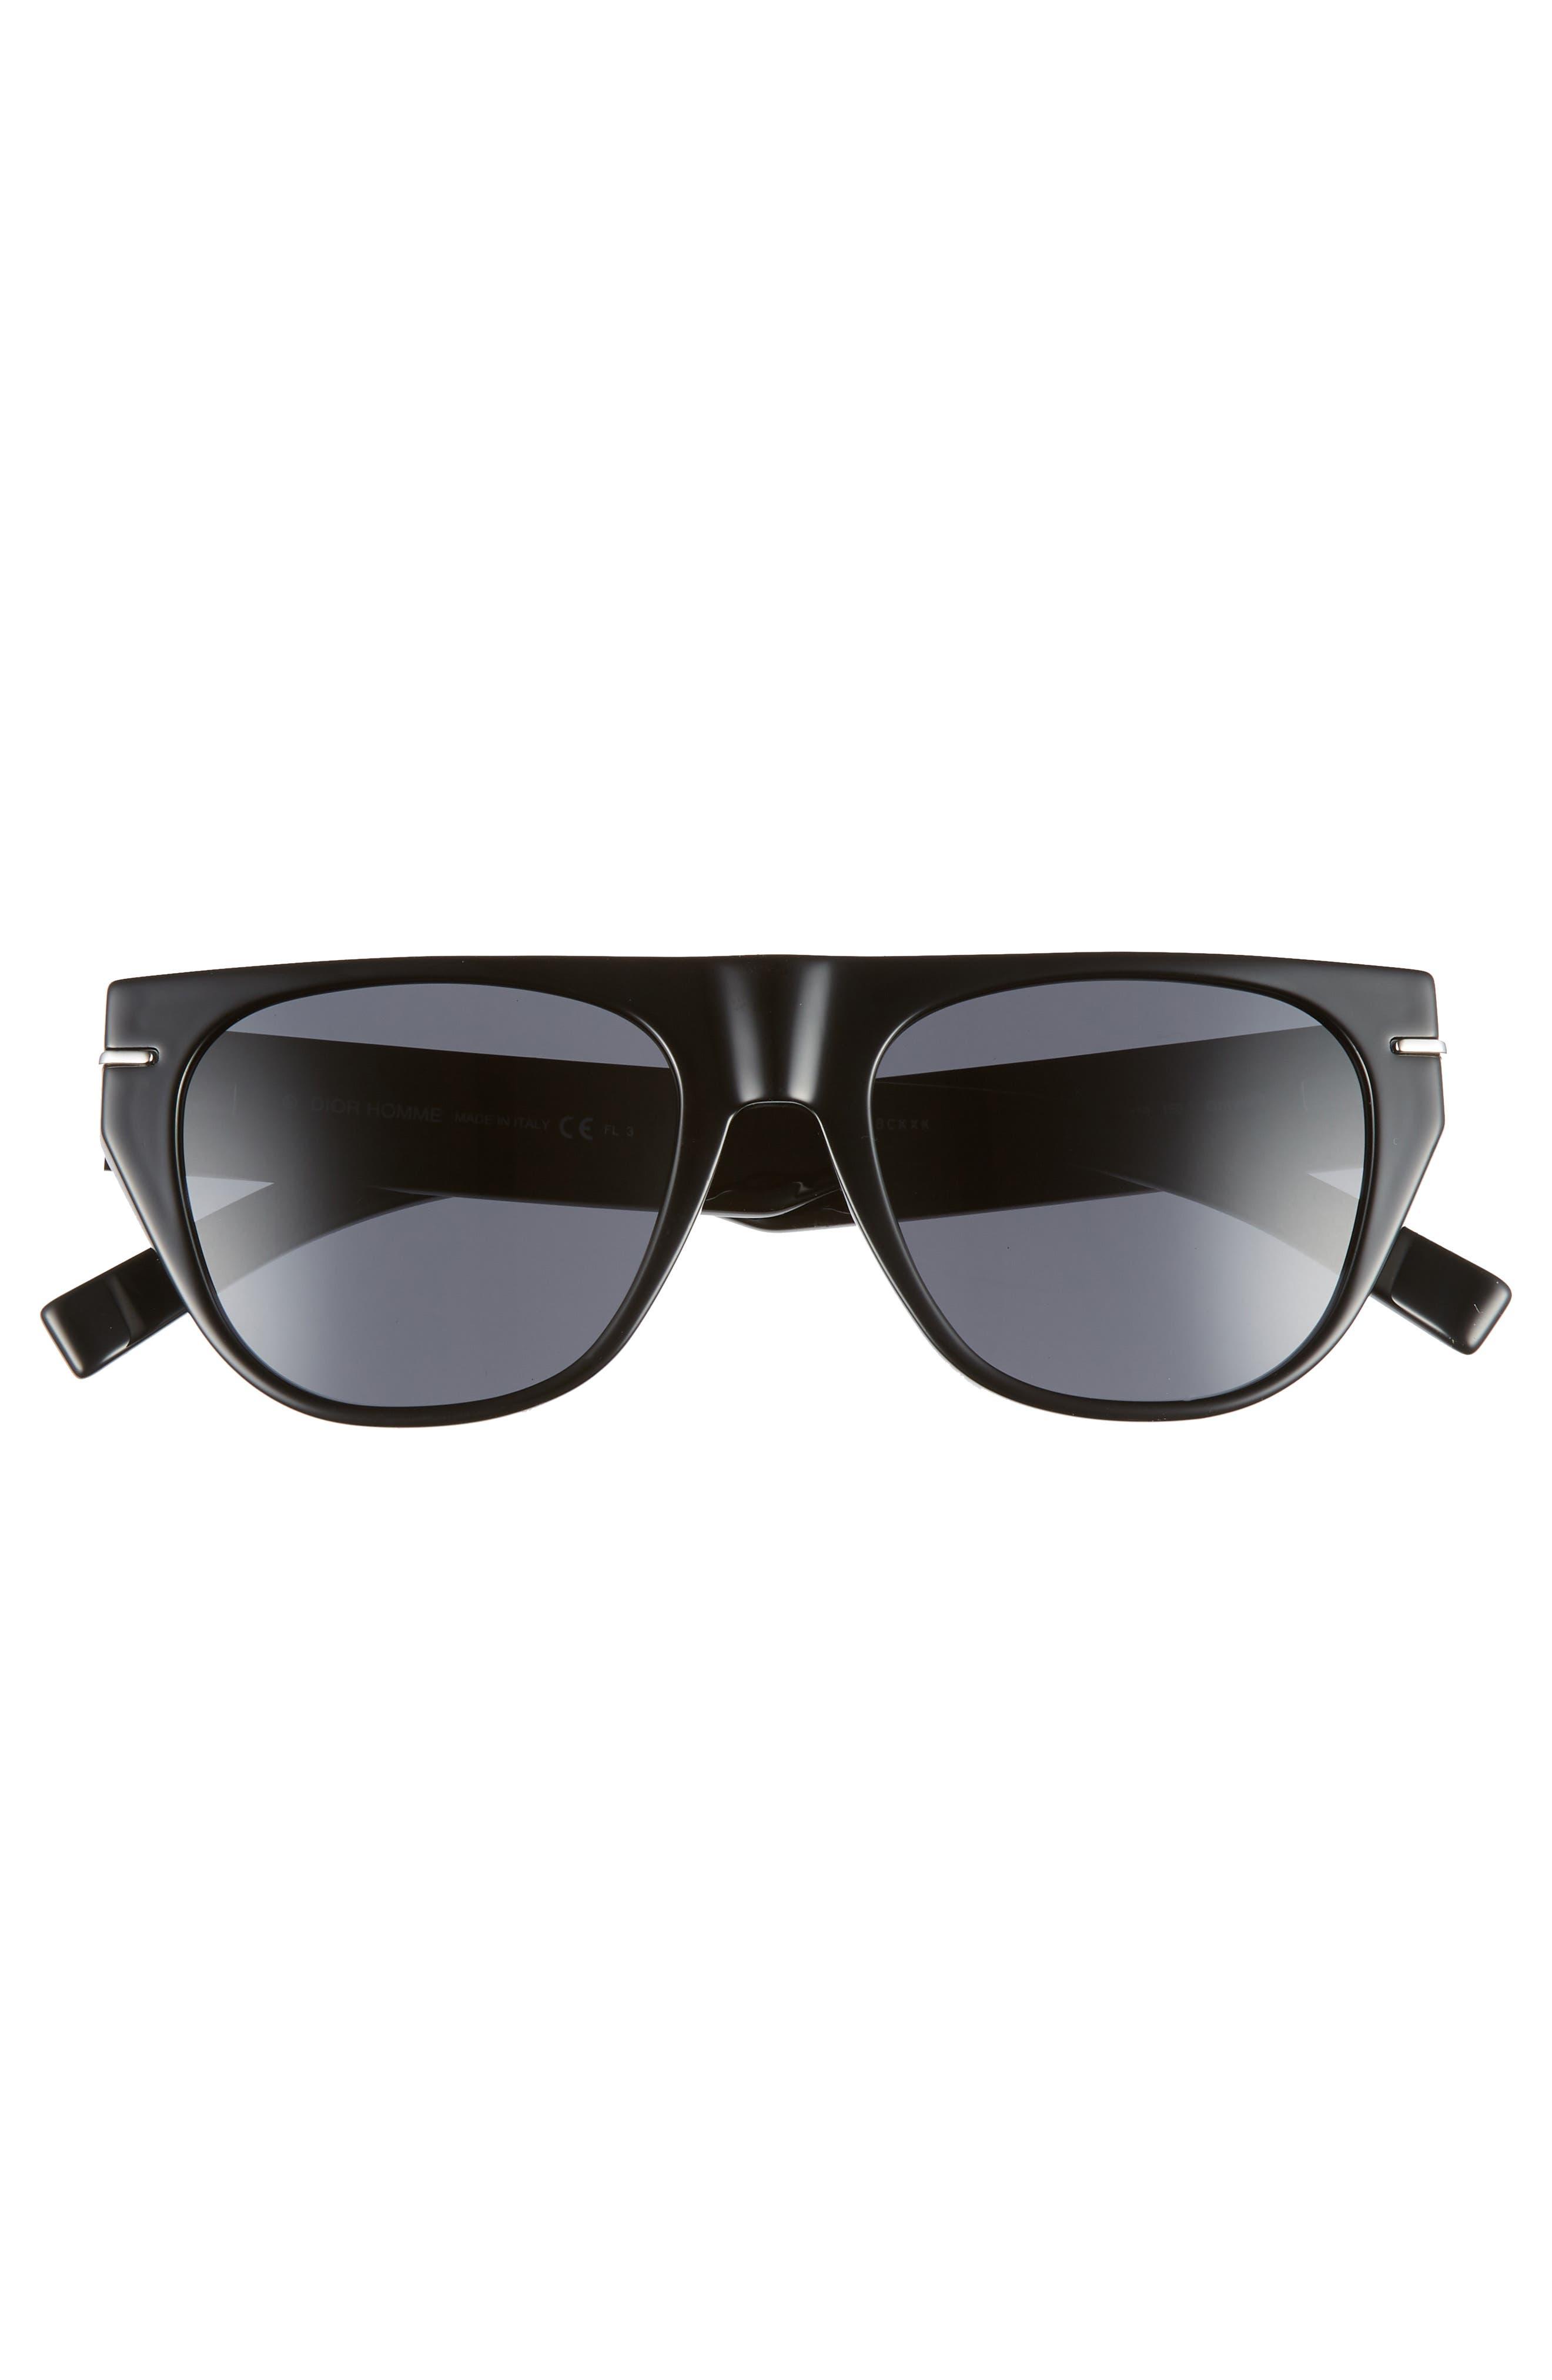 53mm Flat-Top Sunglasses,                             Alternate thumbnail 2, color,                             BLACK